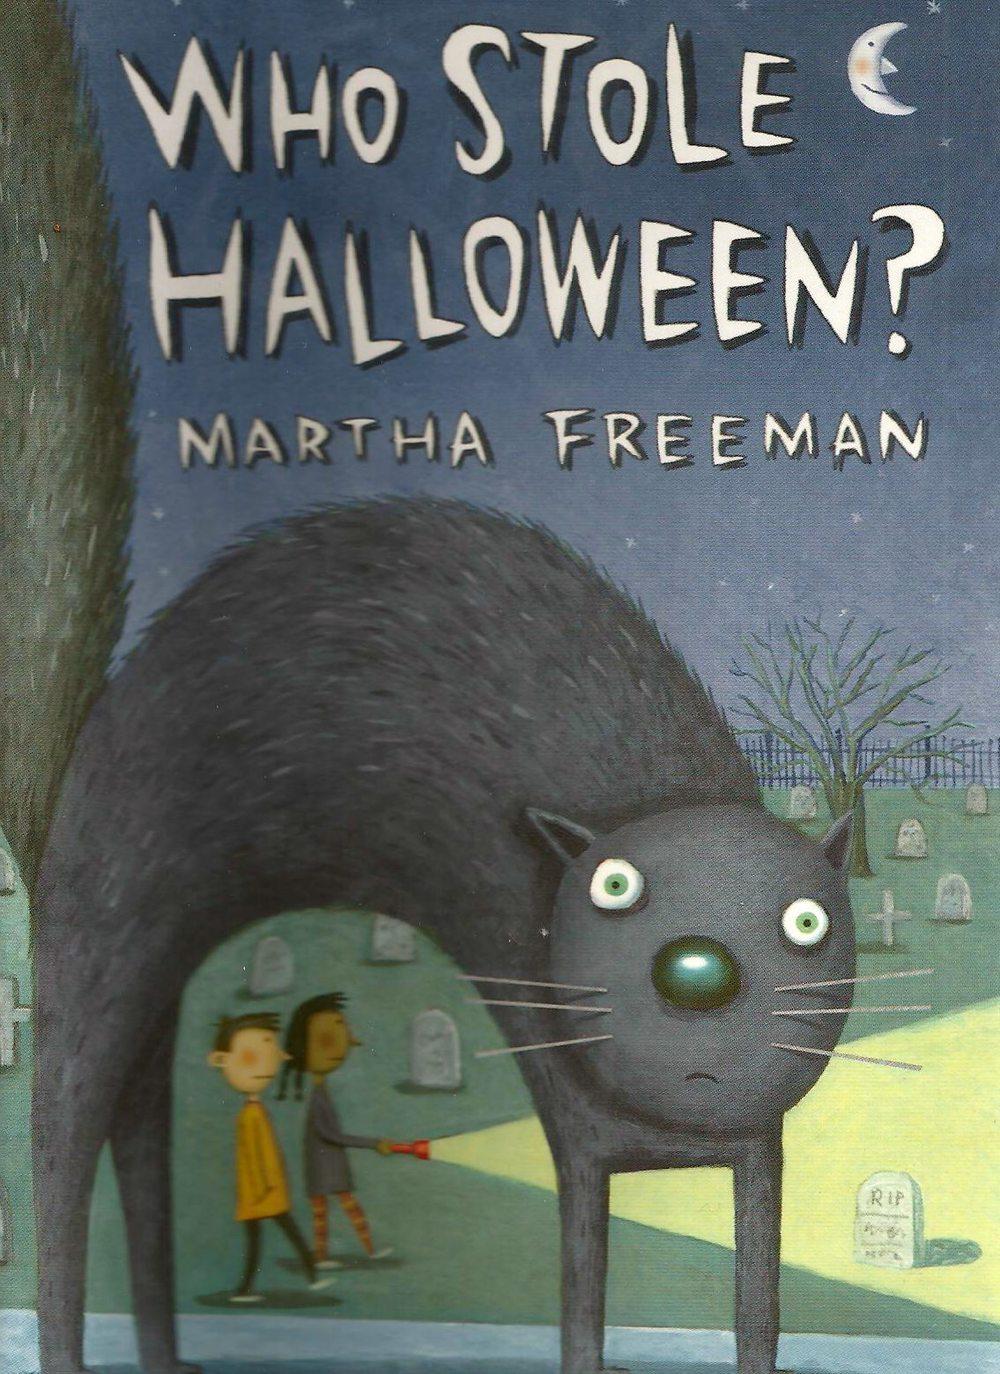 110927 halloween cover 001.jpg